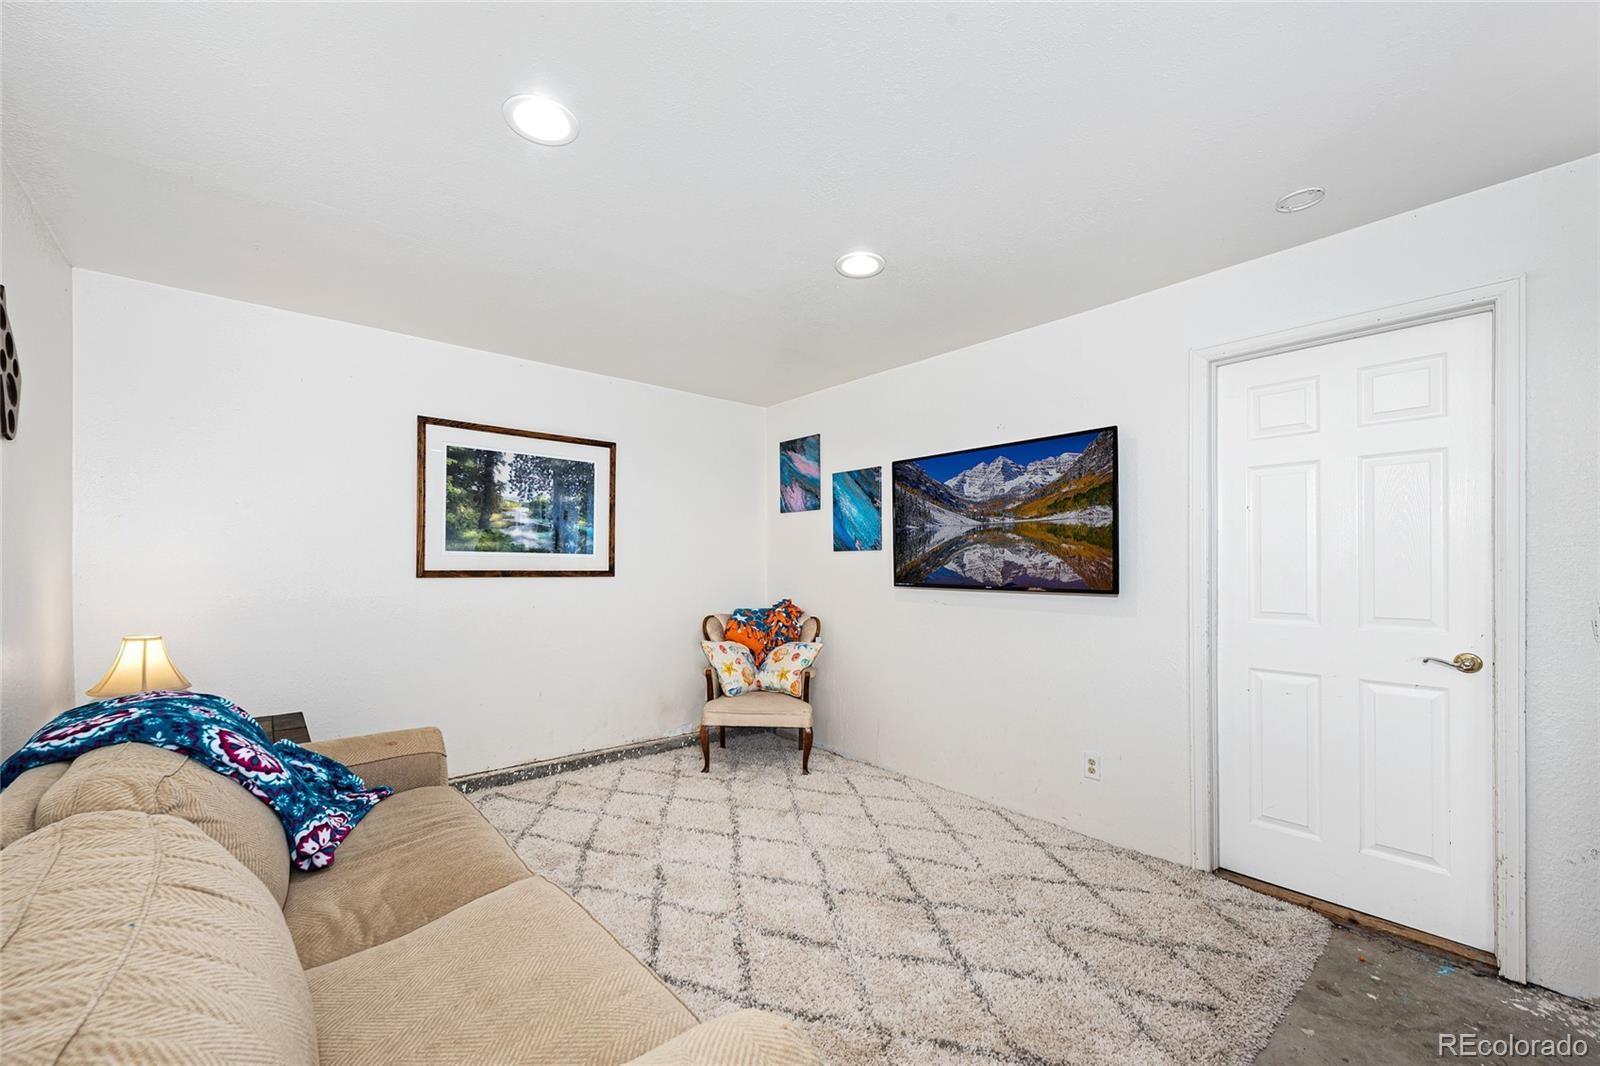 MLS# 8081522 - 25 - 1244 Hyland Drive, Evergreen, CO 80439